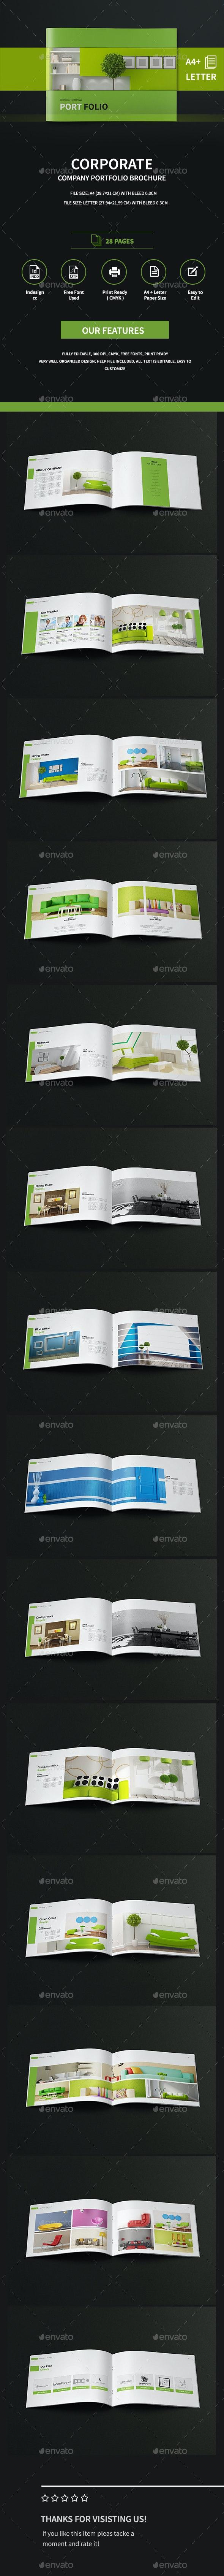 Landscape Company Portfolio Brochure A4 And Letter  - Portfolio Brochures